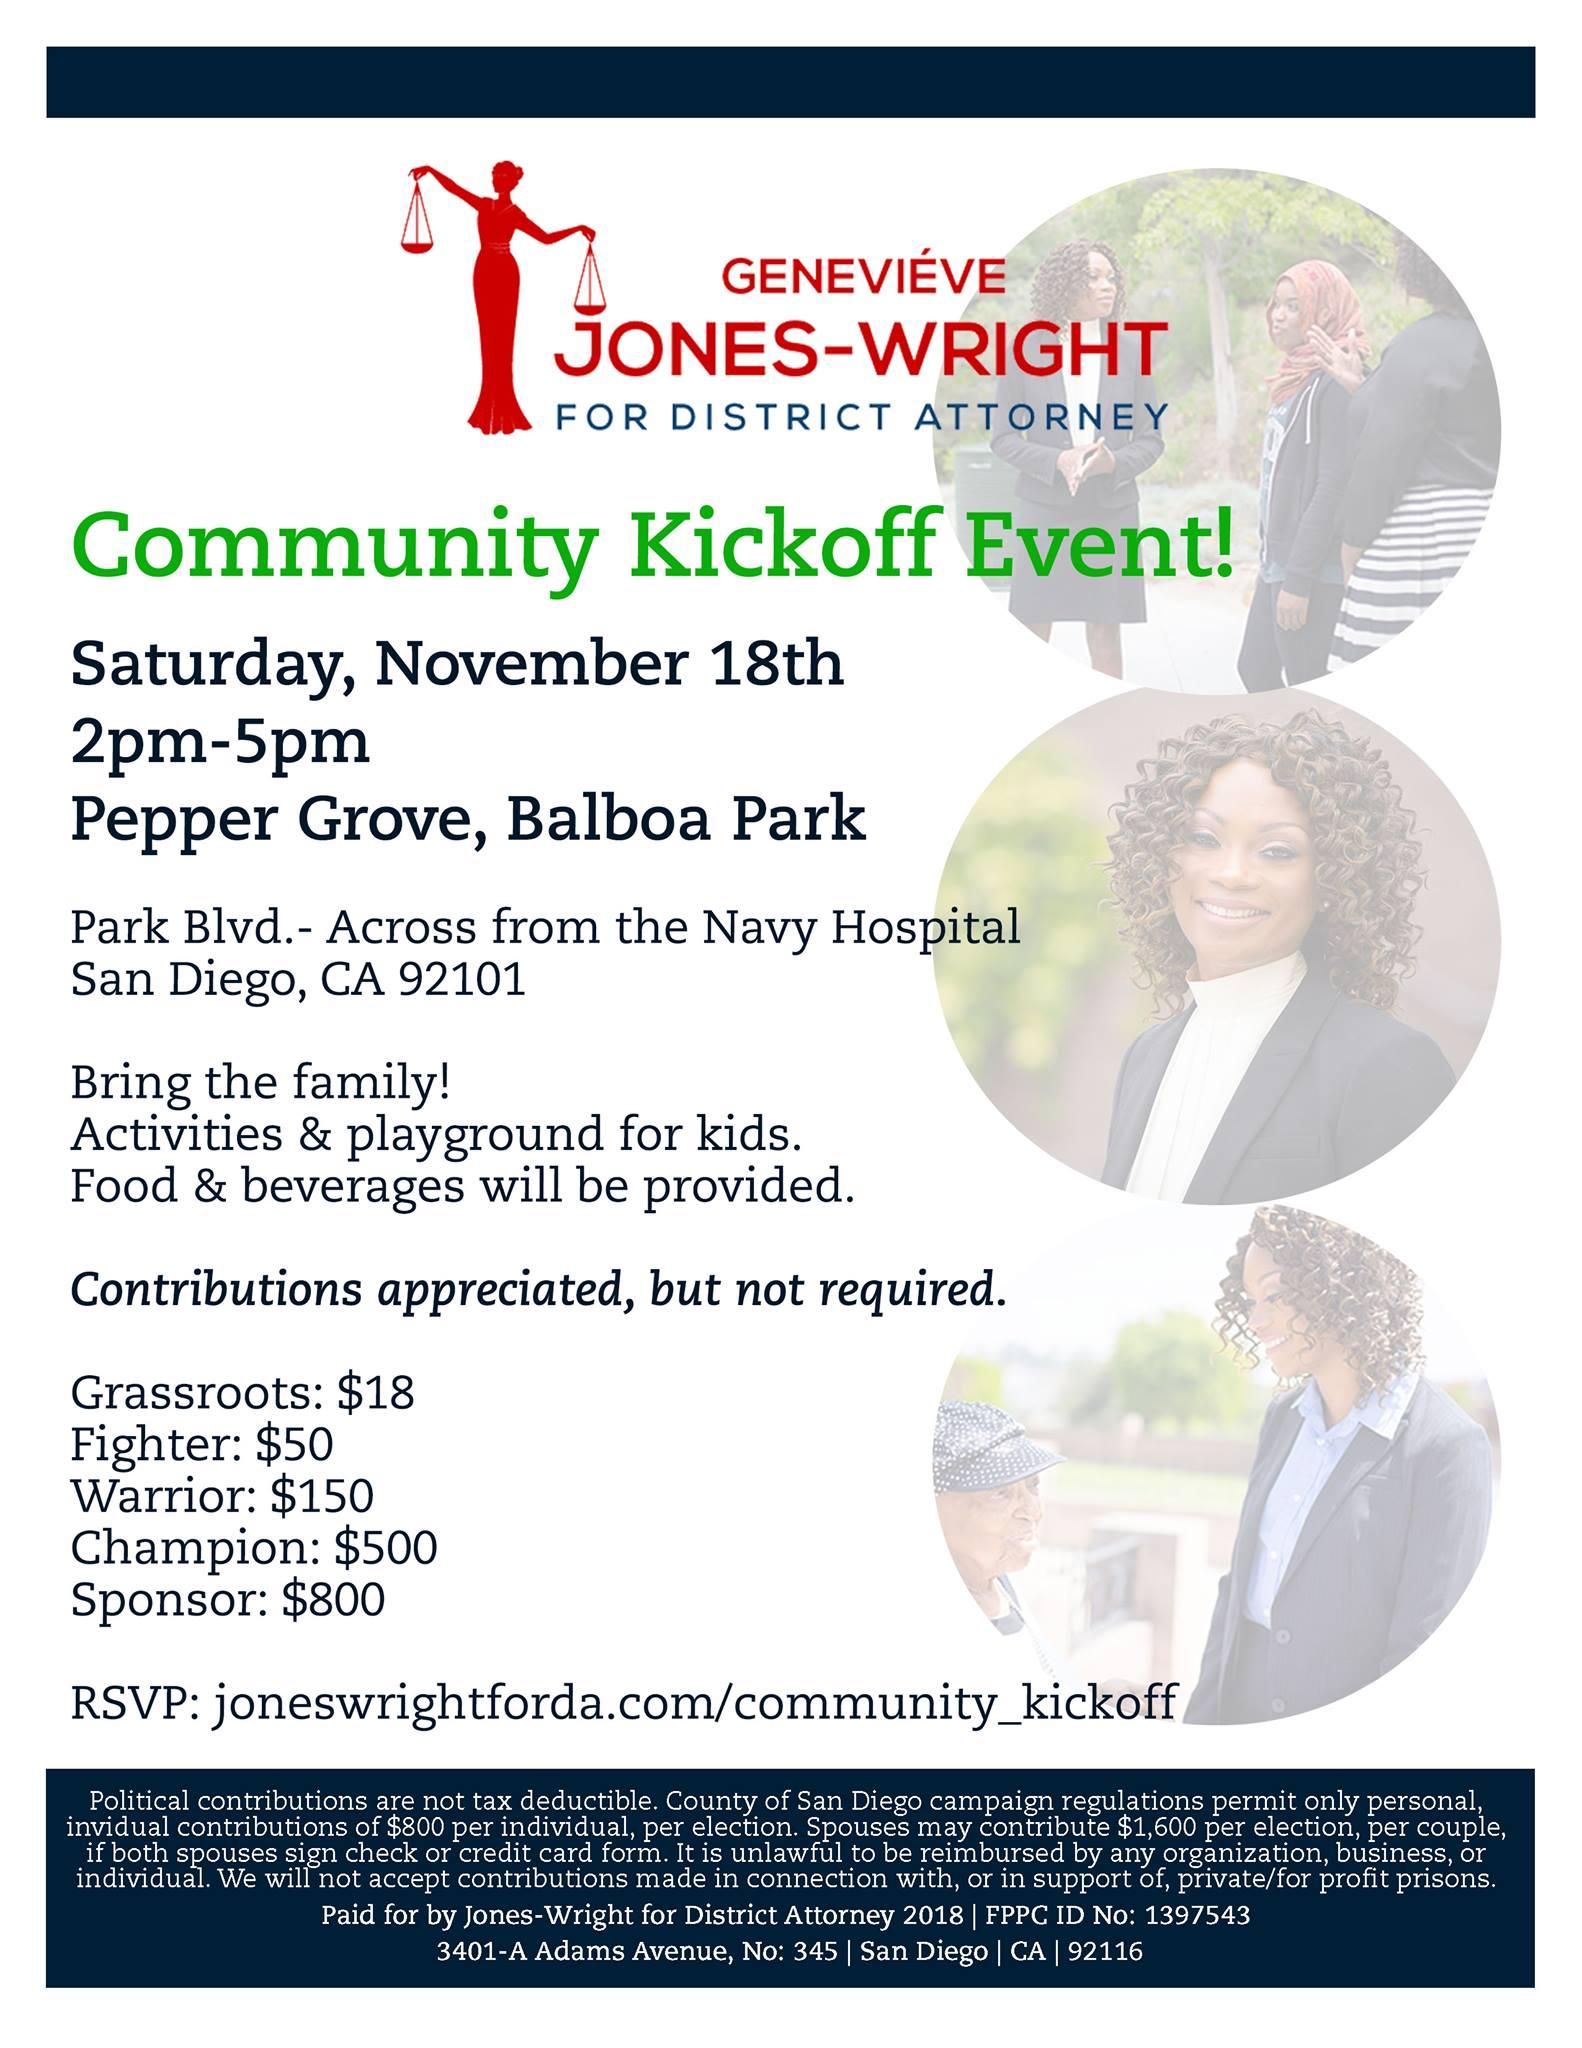 Jones-Wright for DA Community Kickoff @ Balboa Park (Pepper Grove) | San Diego | California | United States